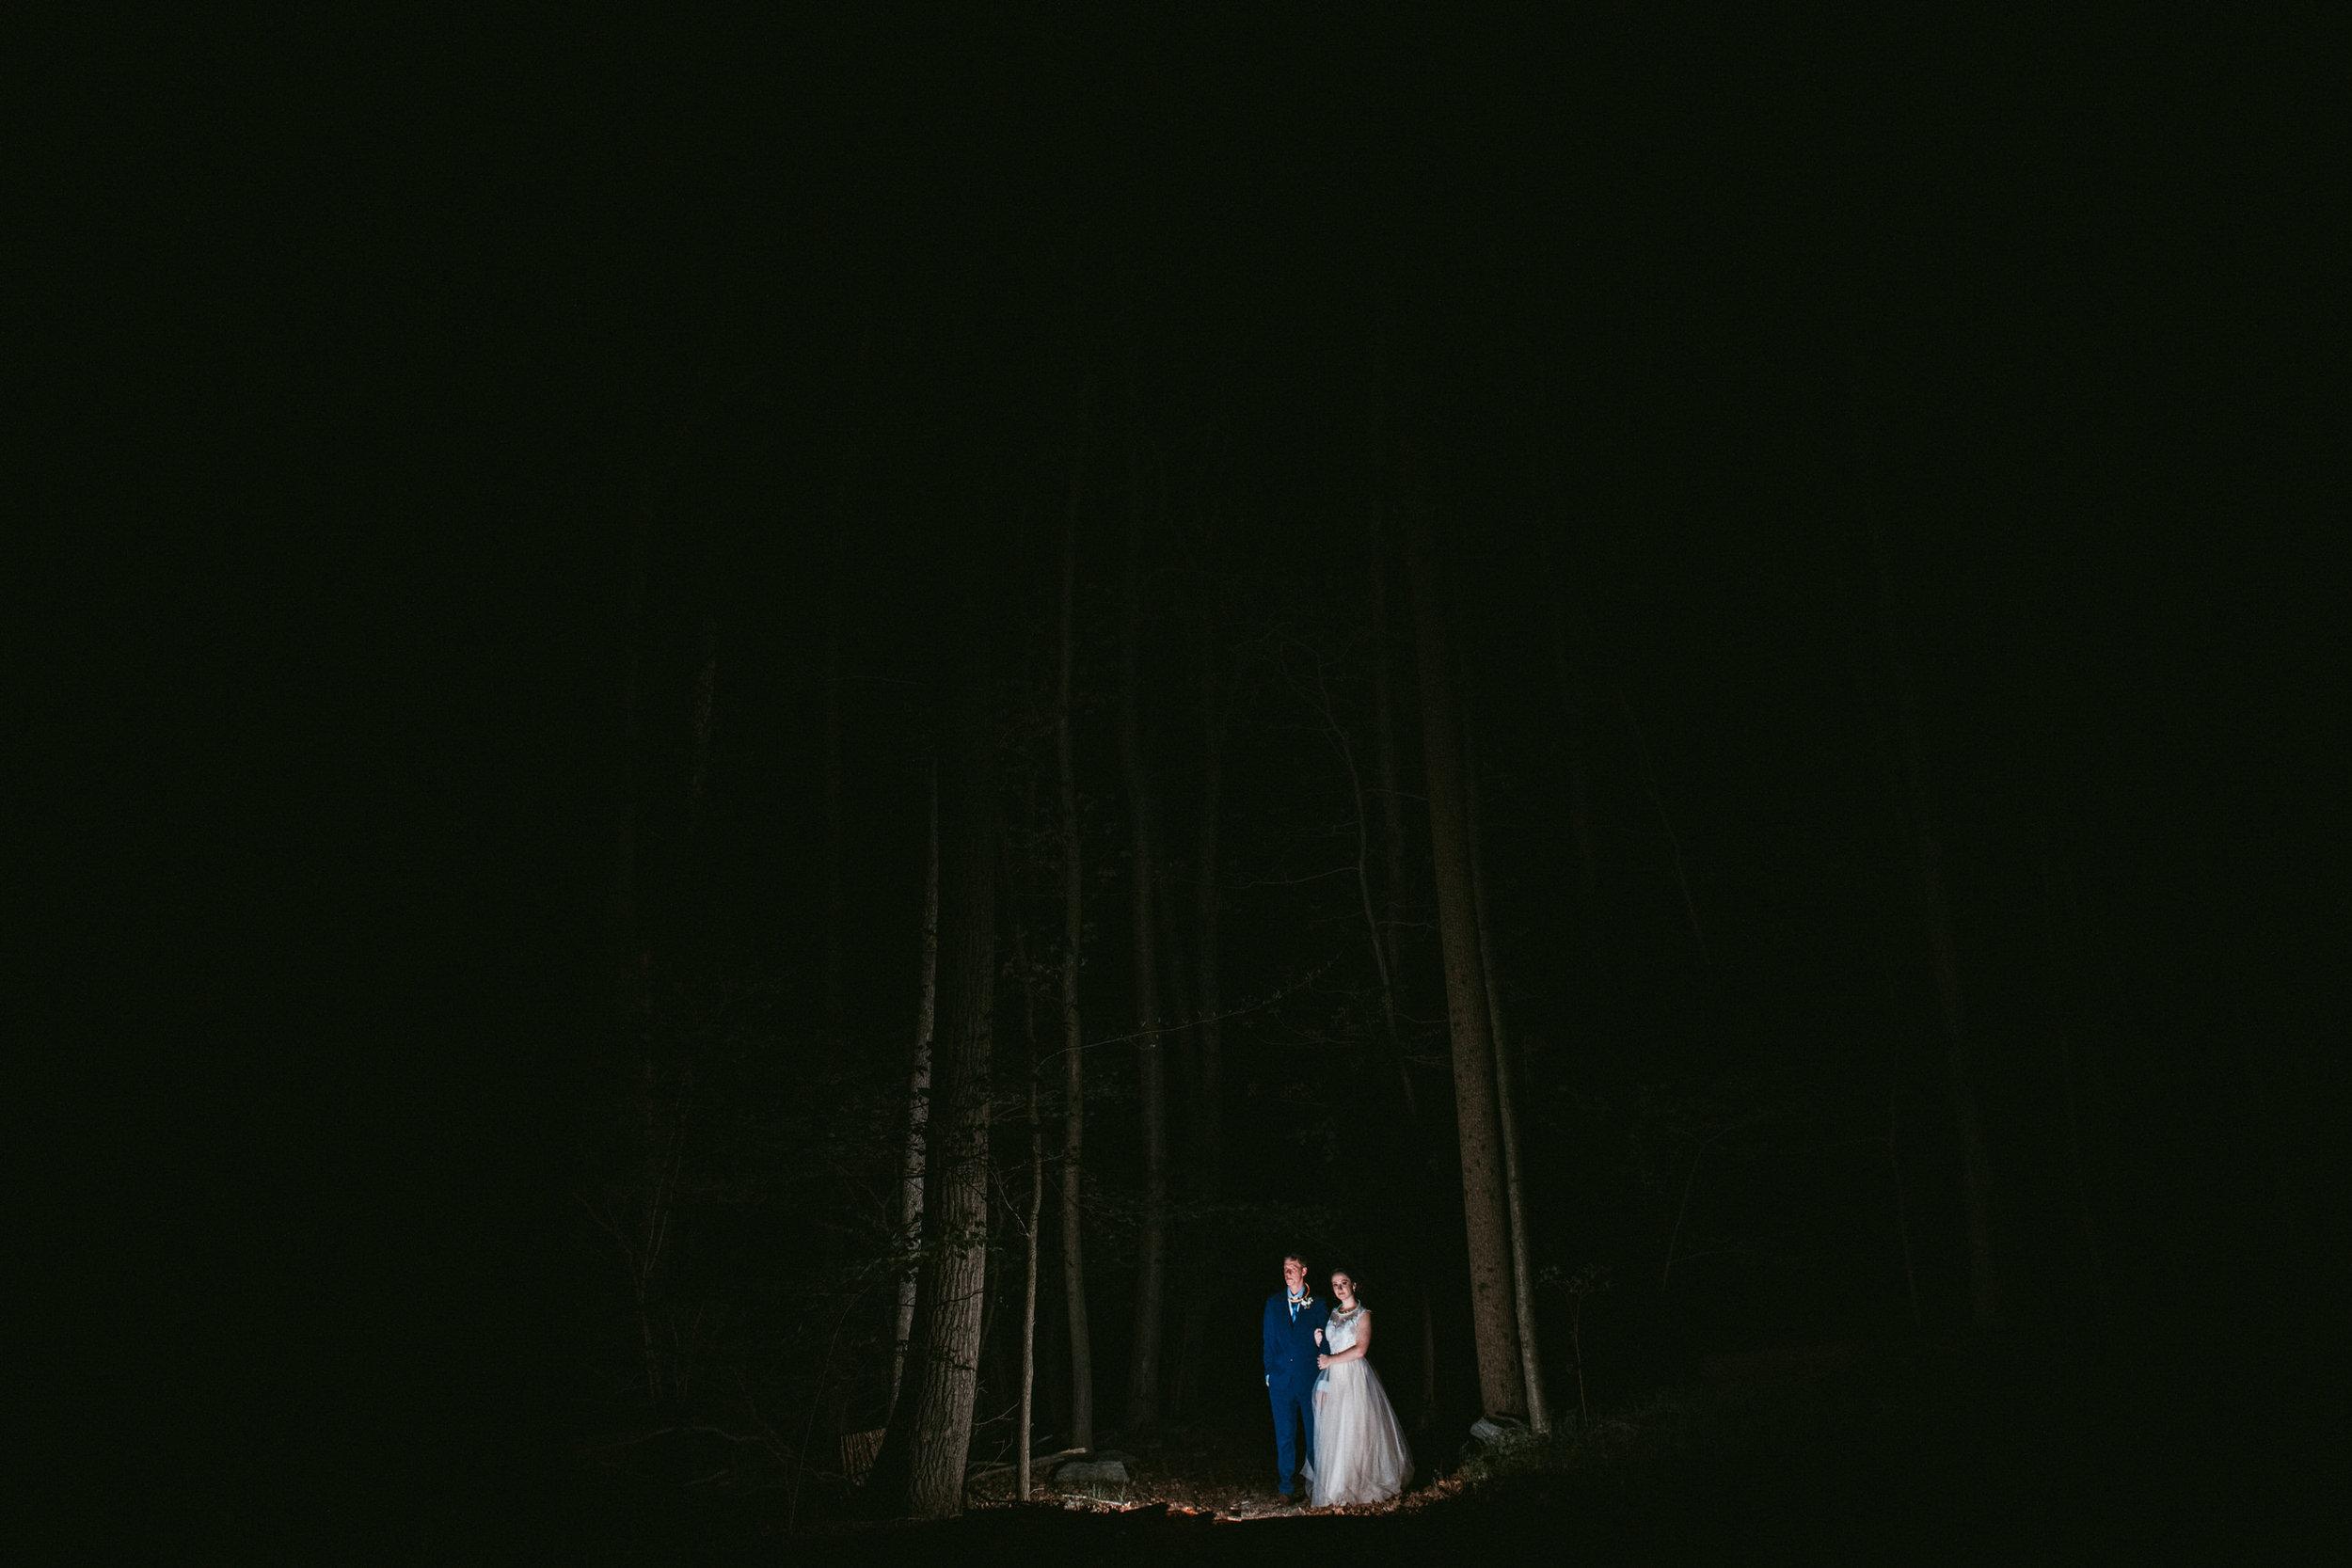 ThorpewoodWedding-Eileen&Chris-8910.jpg